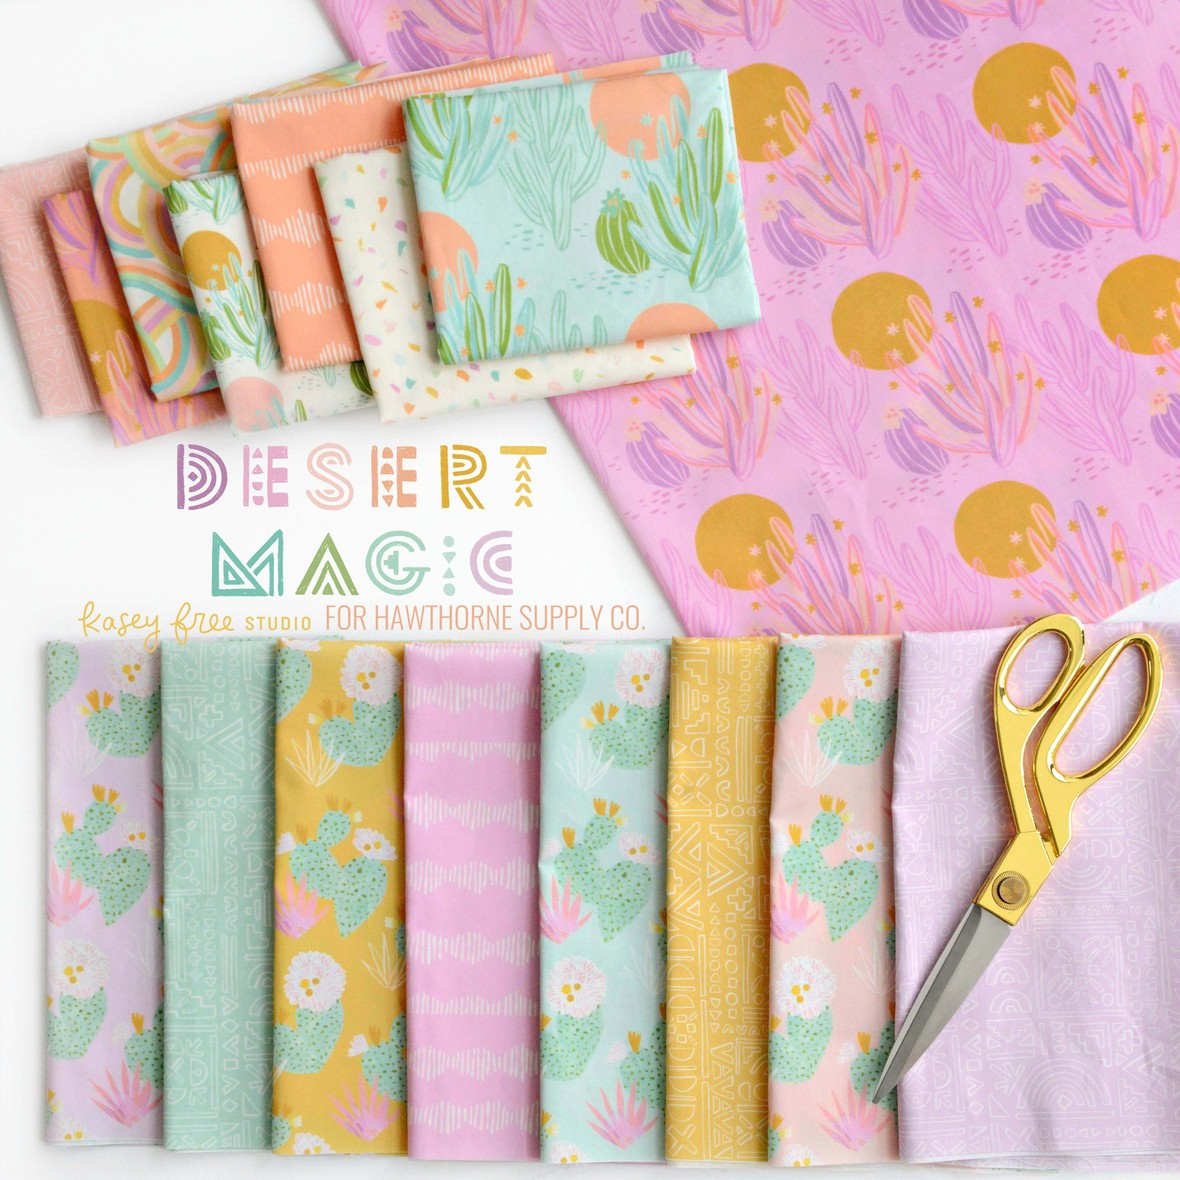 Desert Magic Fabric from Kasey Free Studio for Hawthorne Supply Co